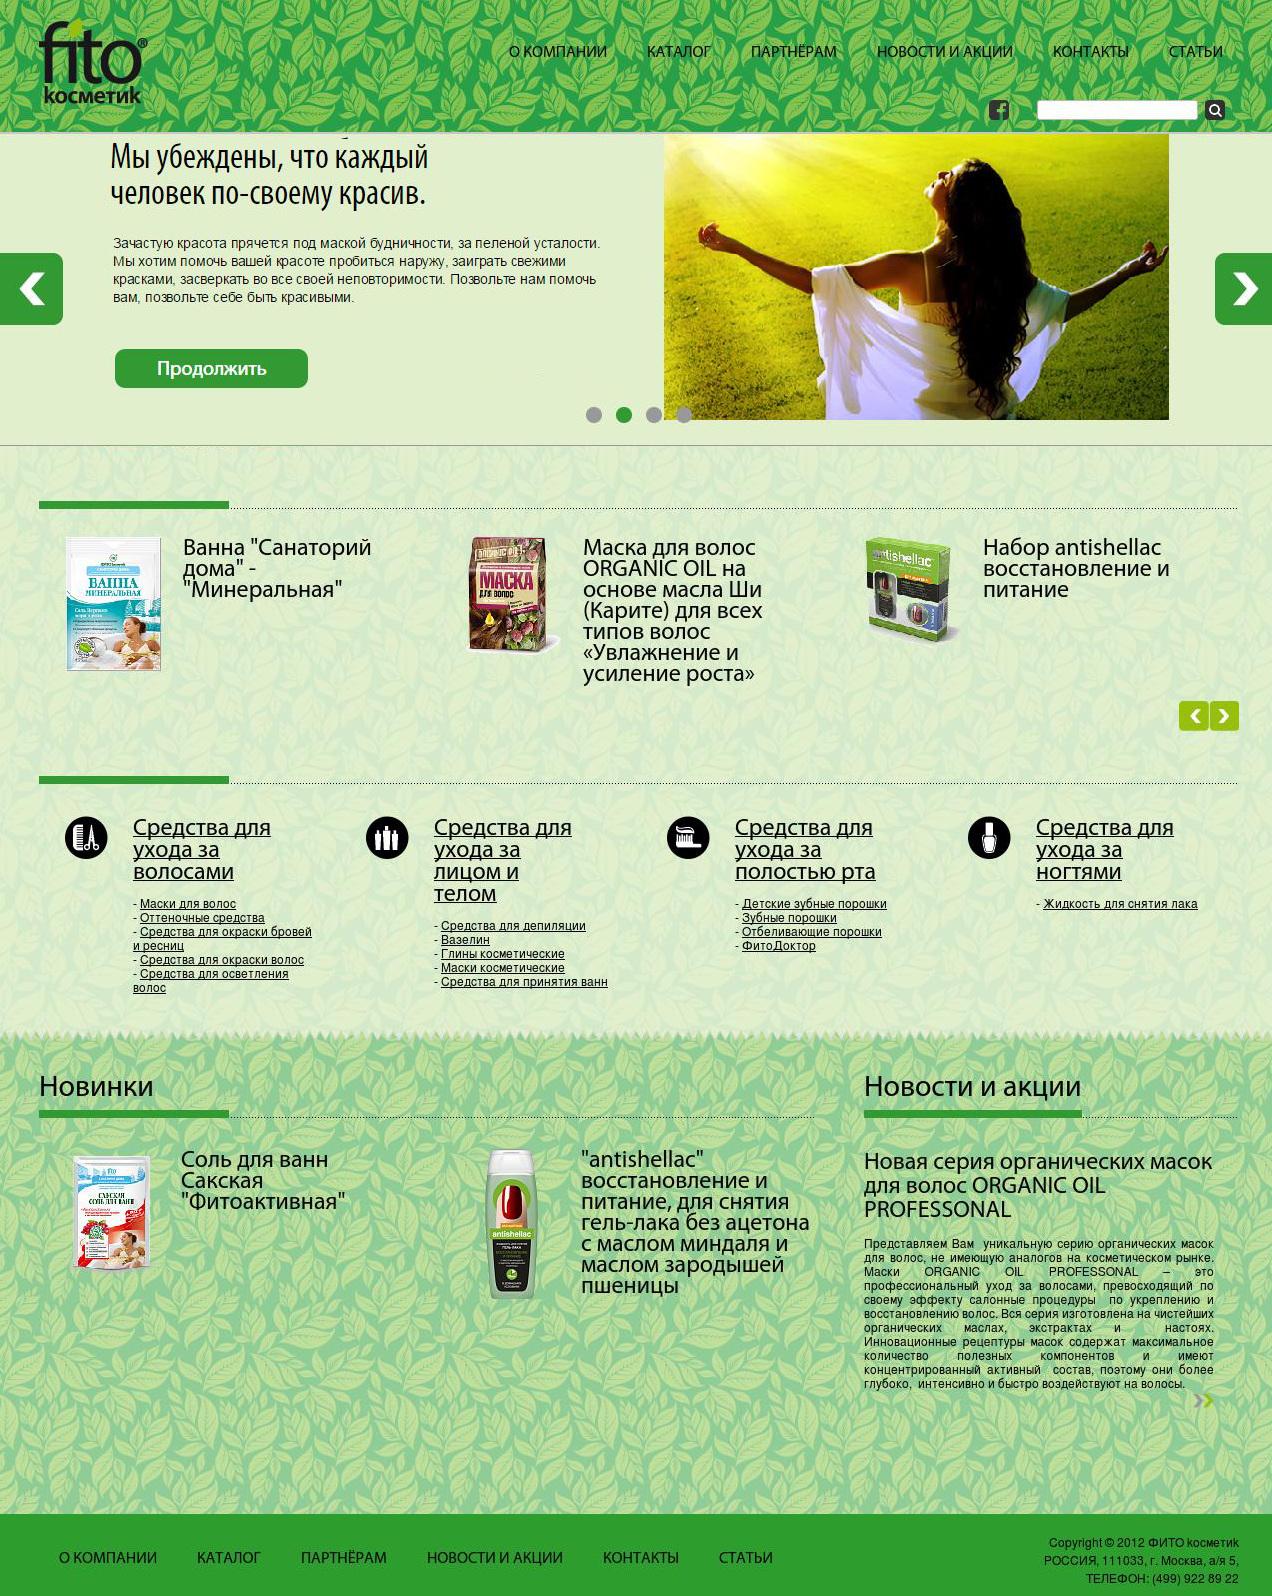 Каталог fitocosmetic.ru (Битрикс)